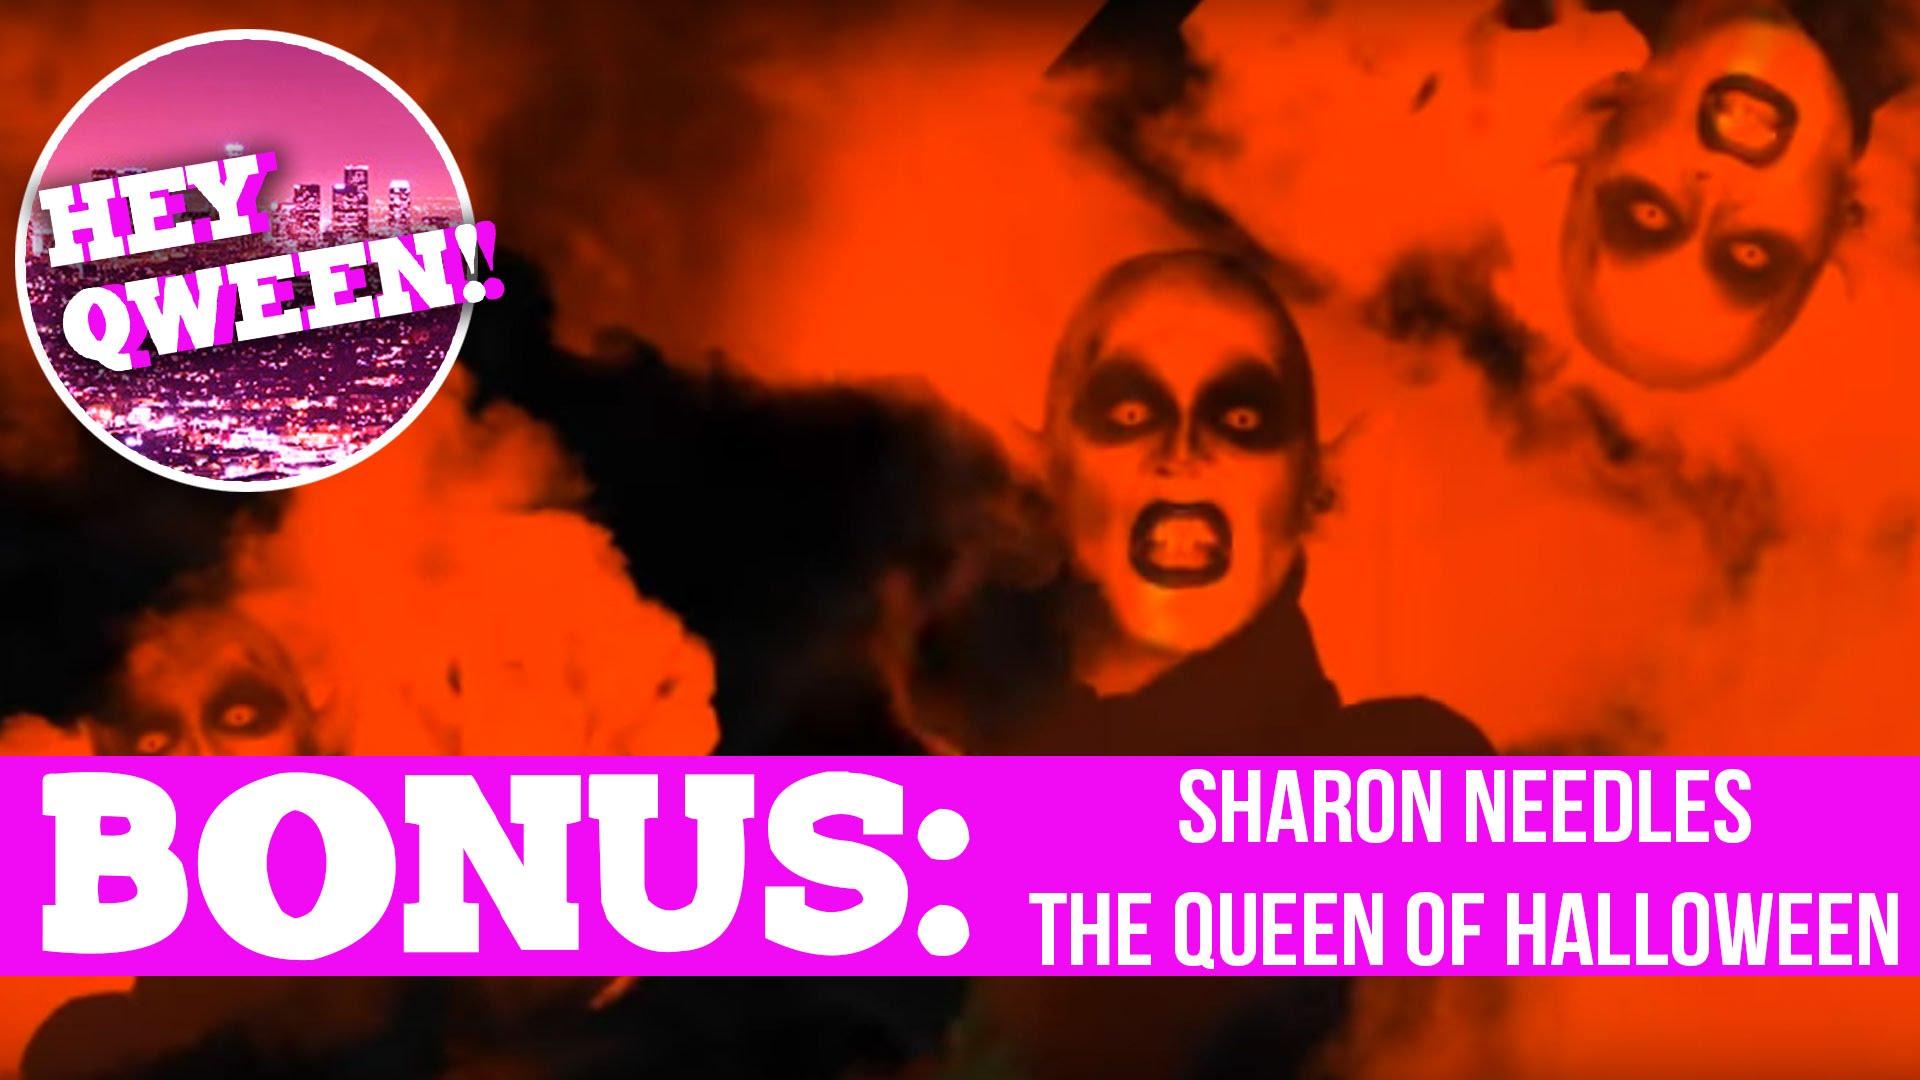 Hey Qween! BONUS Sharon Needles' Halloween Pay Day